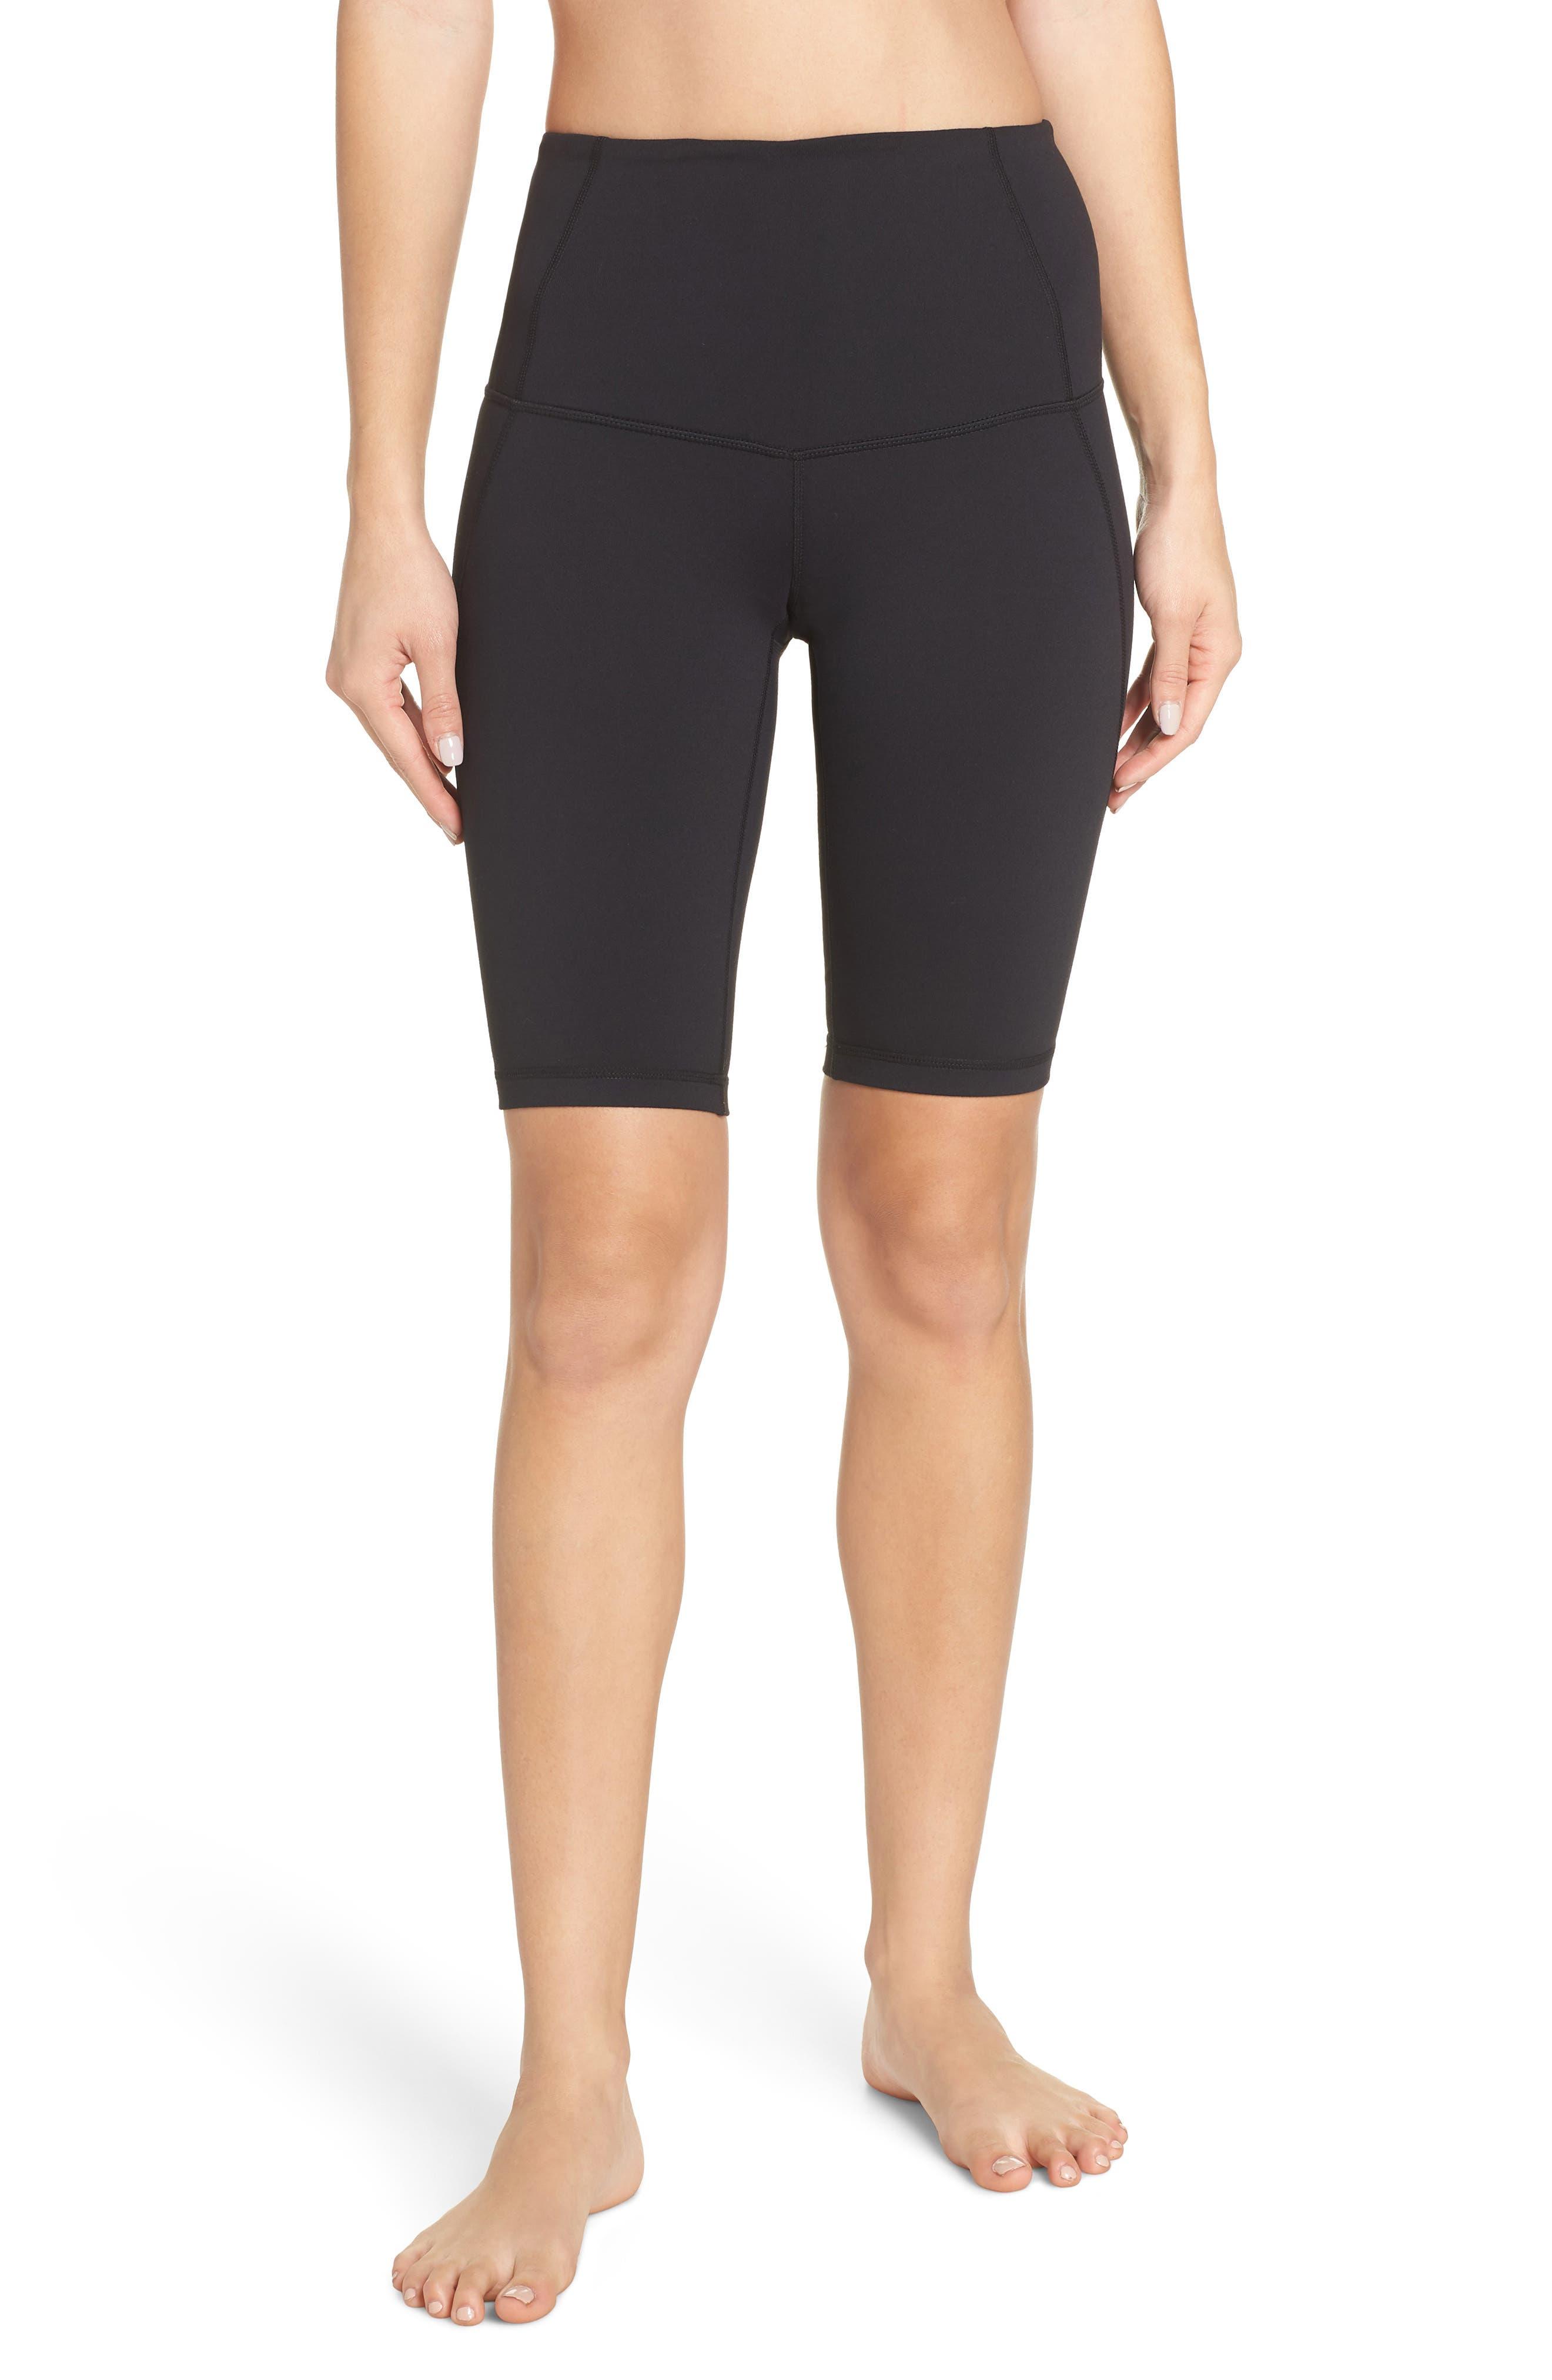 ZELLA Hatha High Waist Bike Shorts, Main, color, BLACK